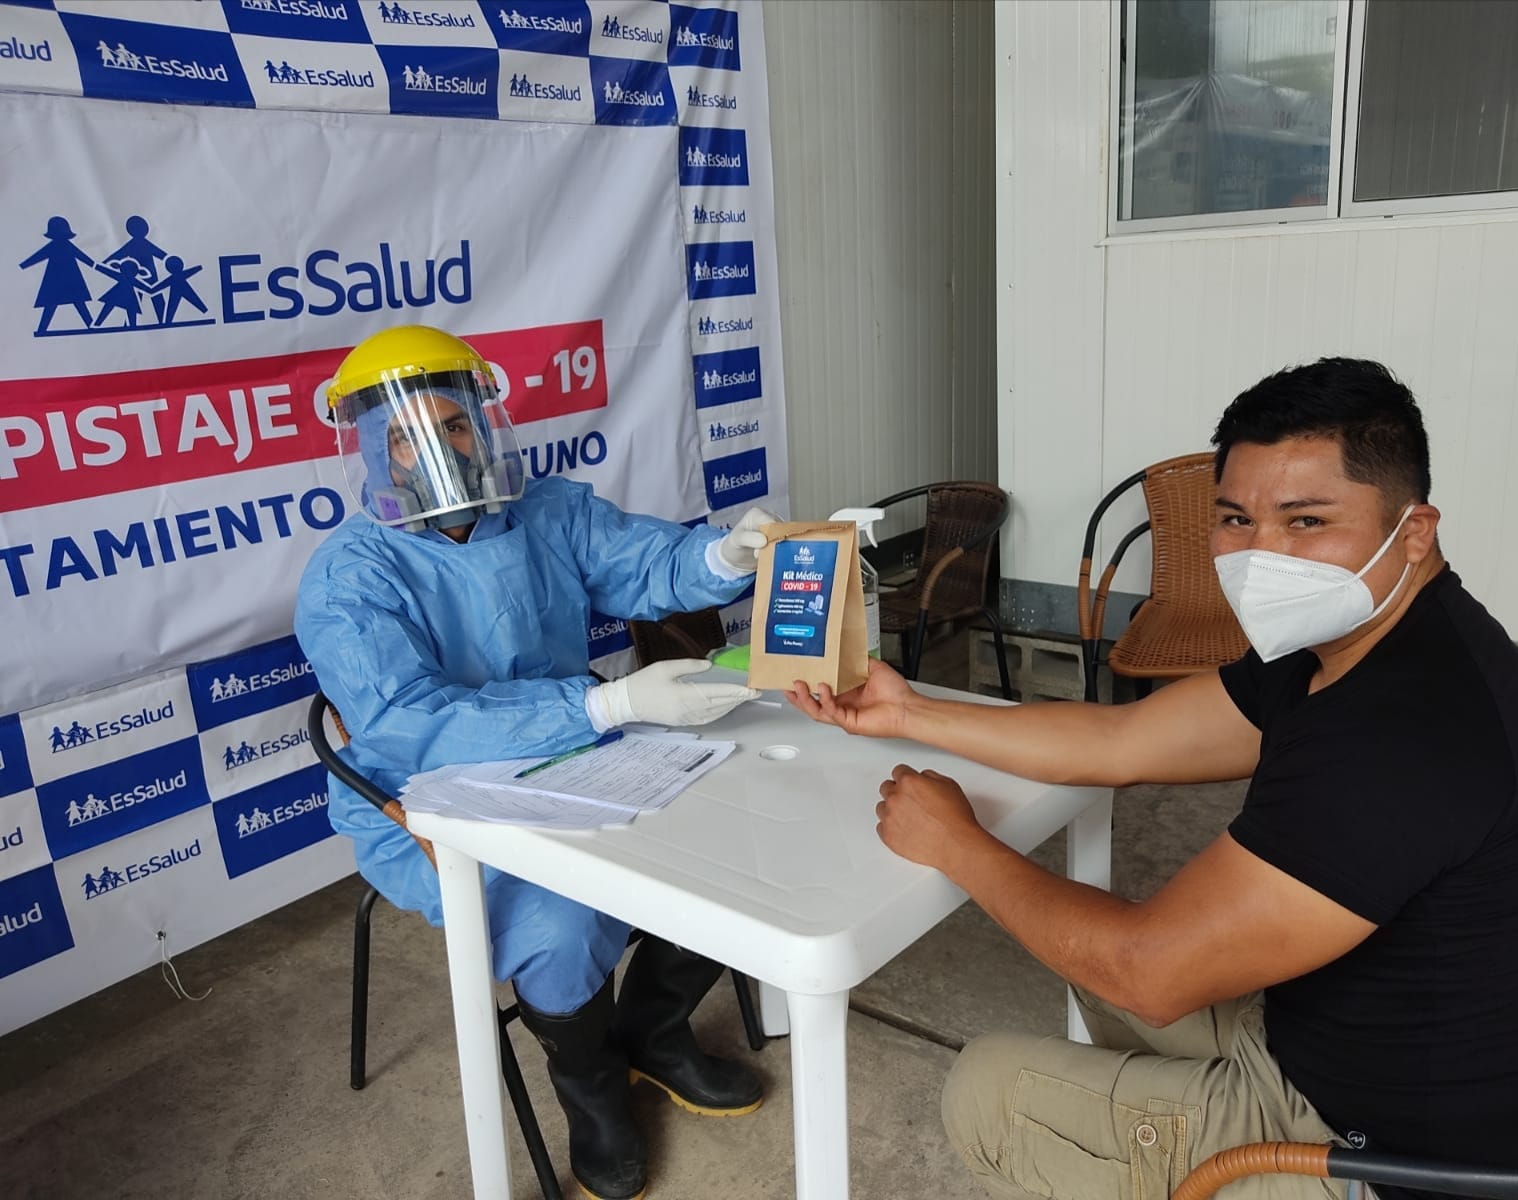 Essalud - EsSalud Moyobamba inició jornadas de despistaje de Covid -19